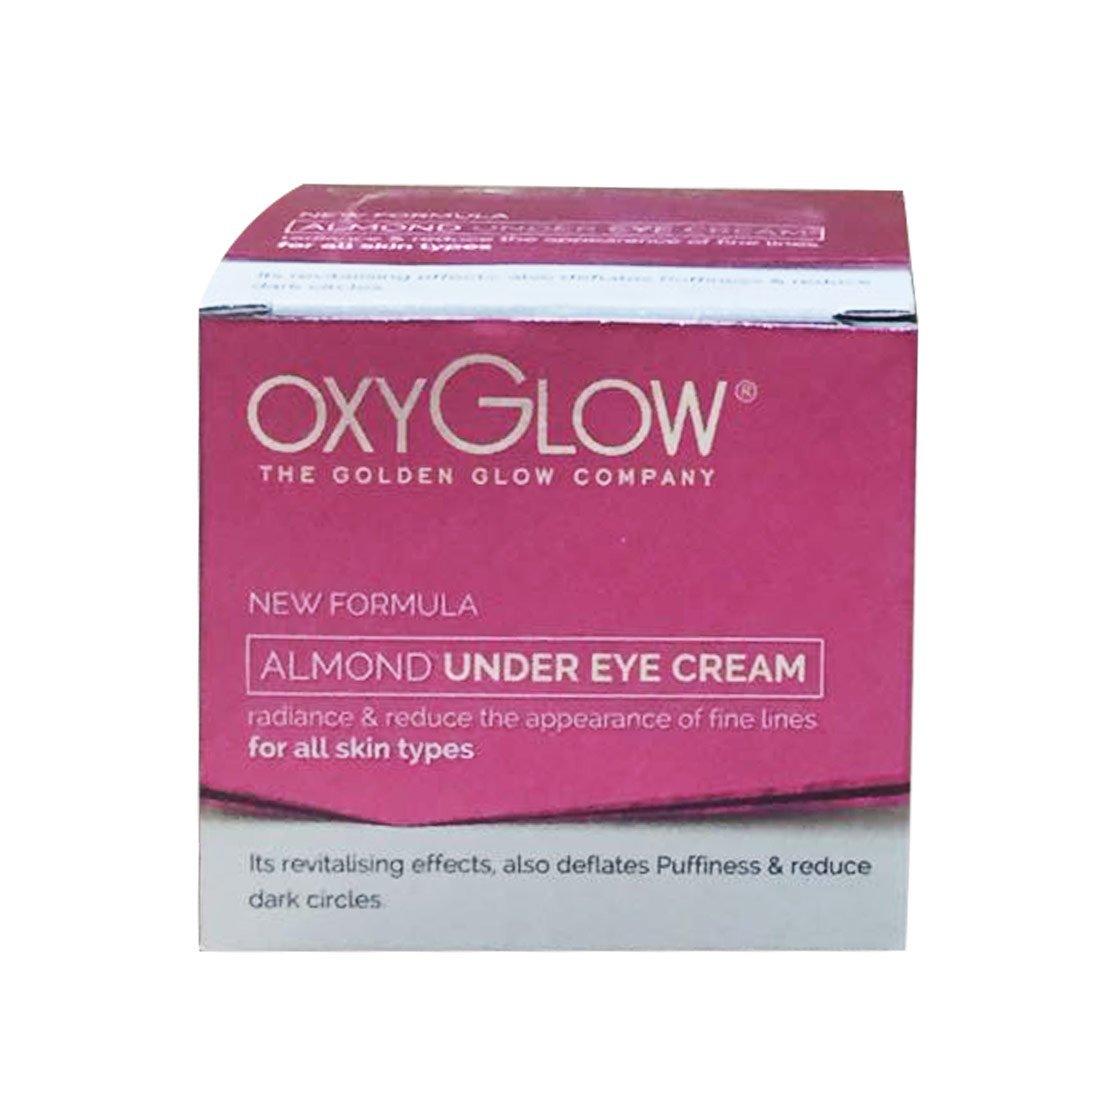 Buy Oxy Glow Almond Under Eye Repair Cream Online MY